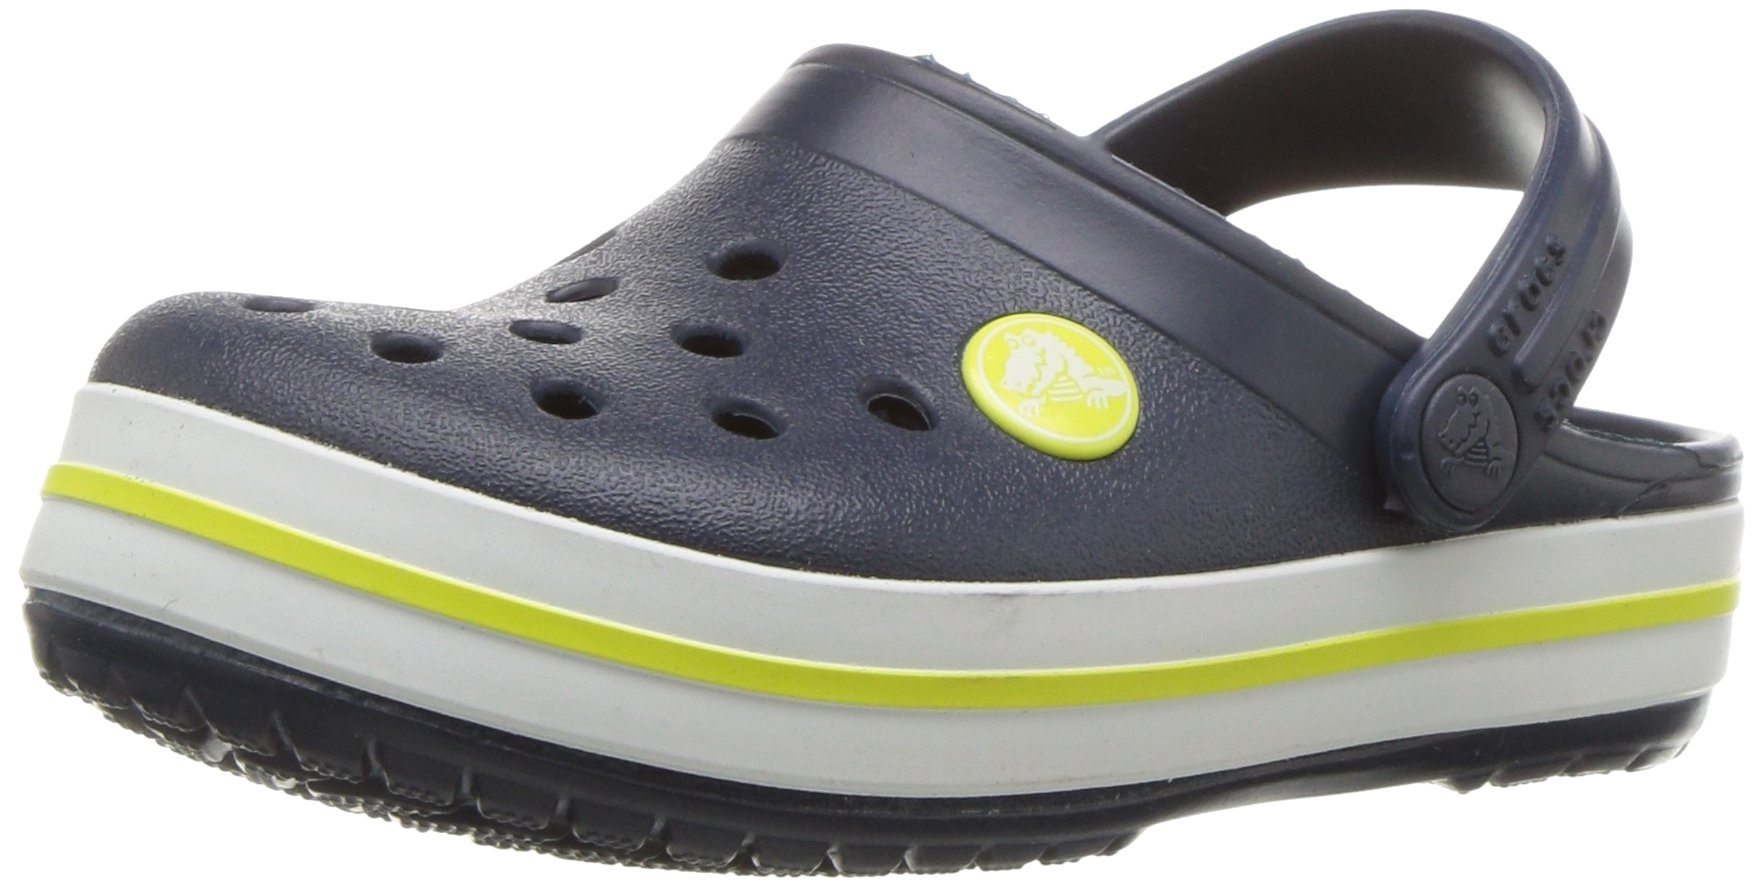 7584d59bf45a Galleon - Crocs Kids  Crocband Clog